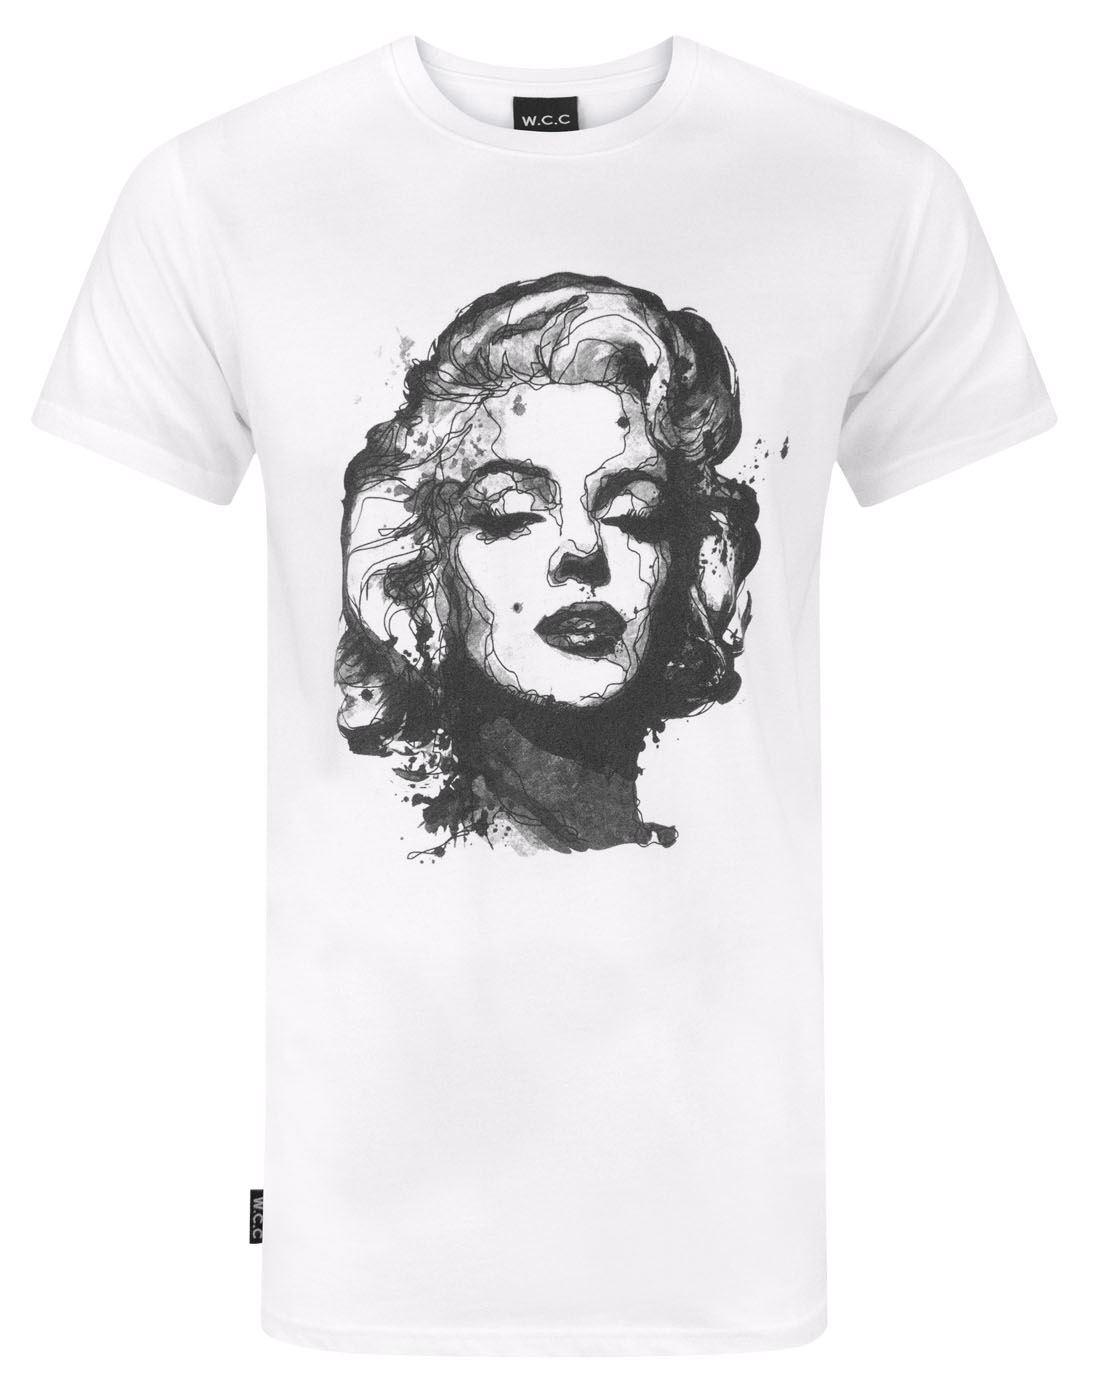 Marilyn Monroe Comic Style White T Shirt Men Woman Unisex BRAND NEW